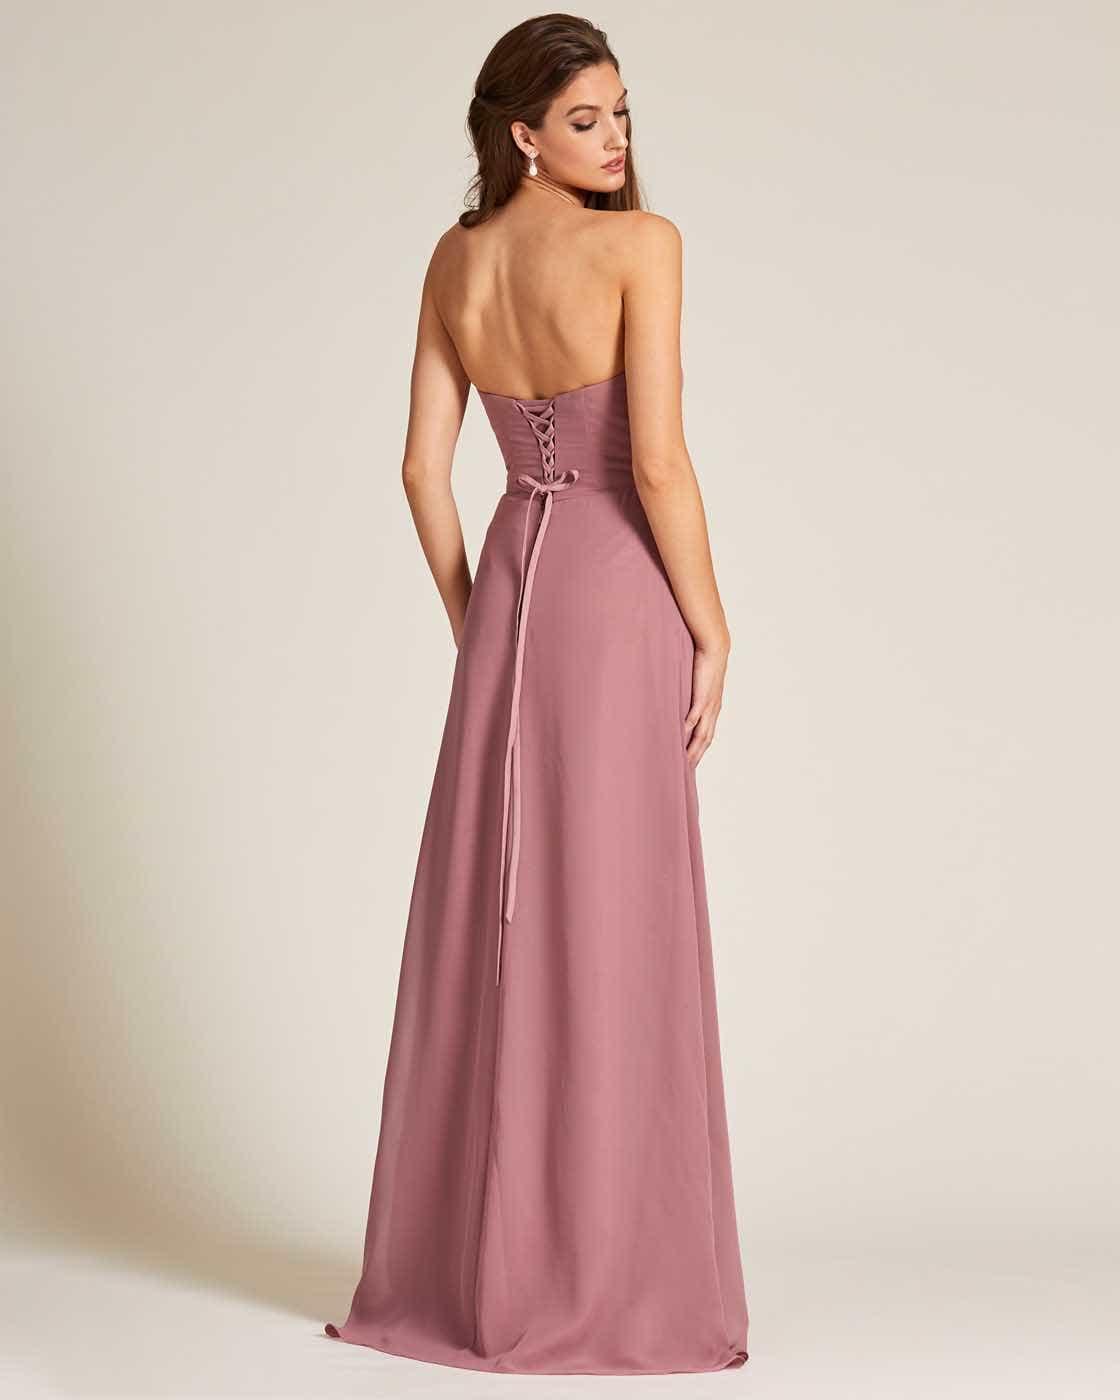 Mauve Strapless Tie Back Evening Dress - Back